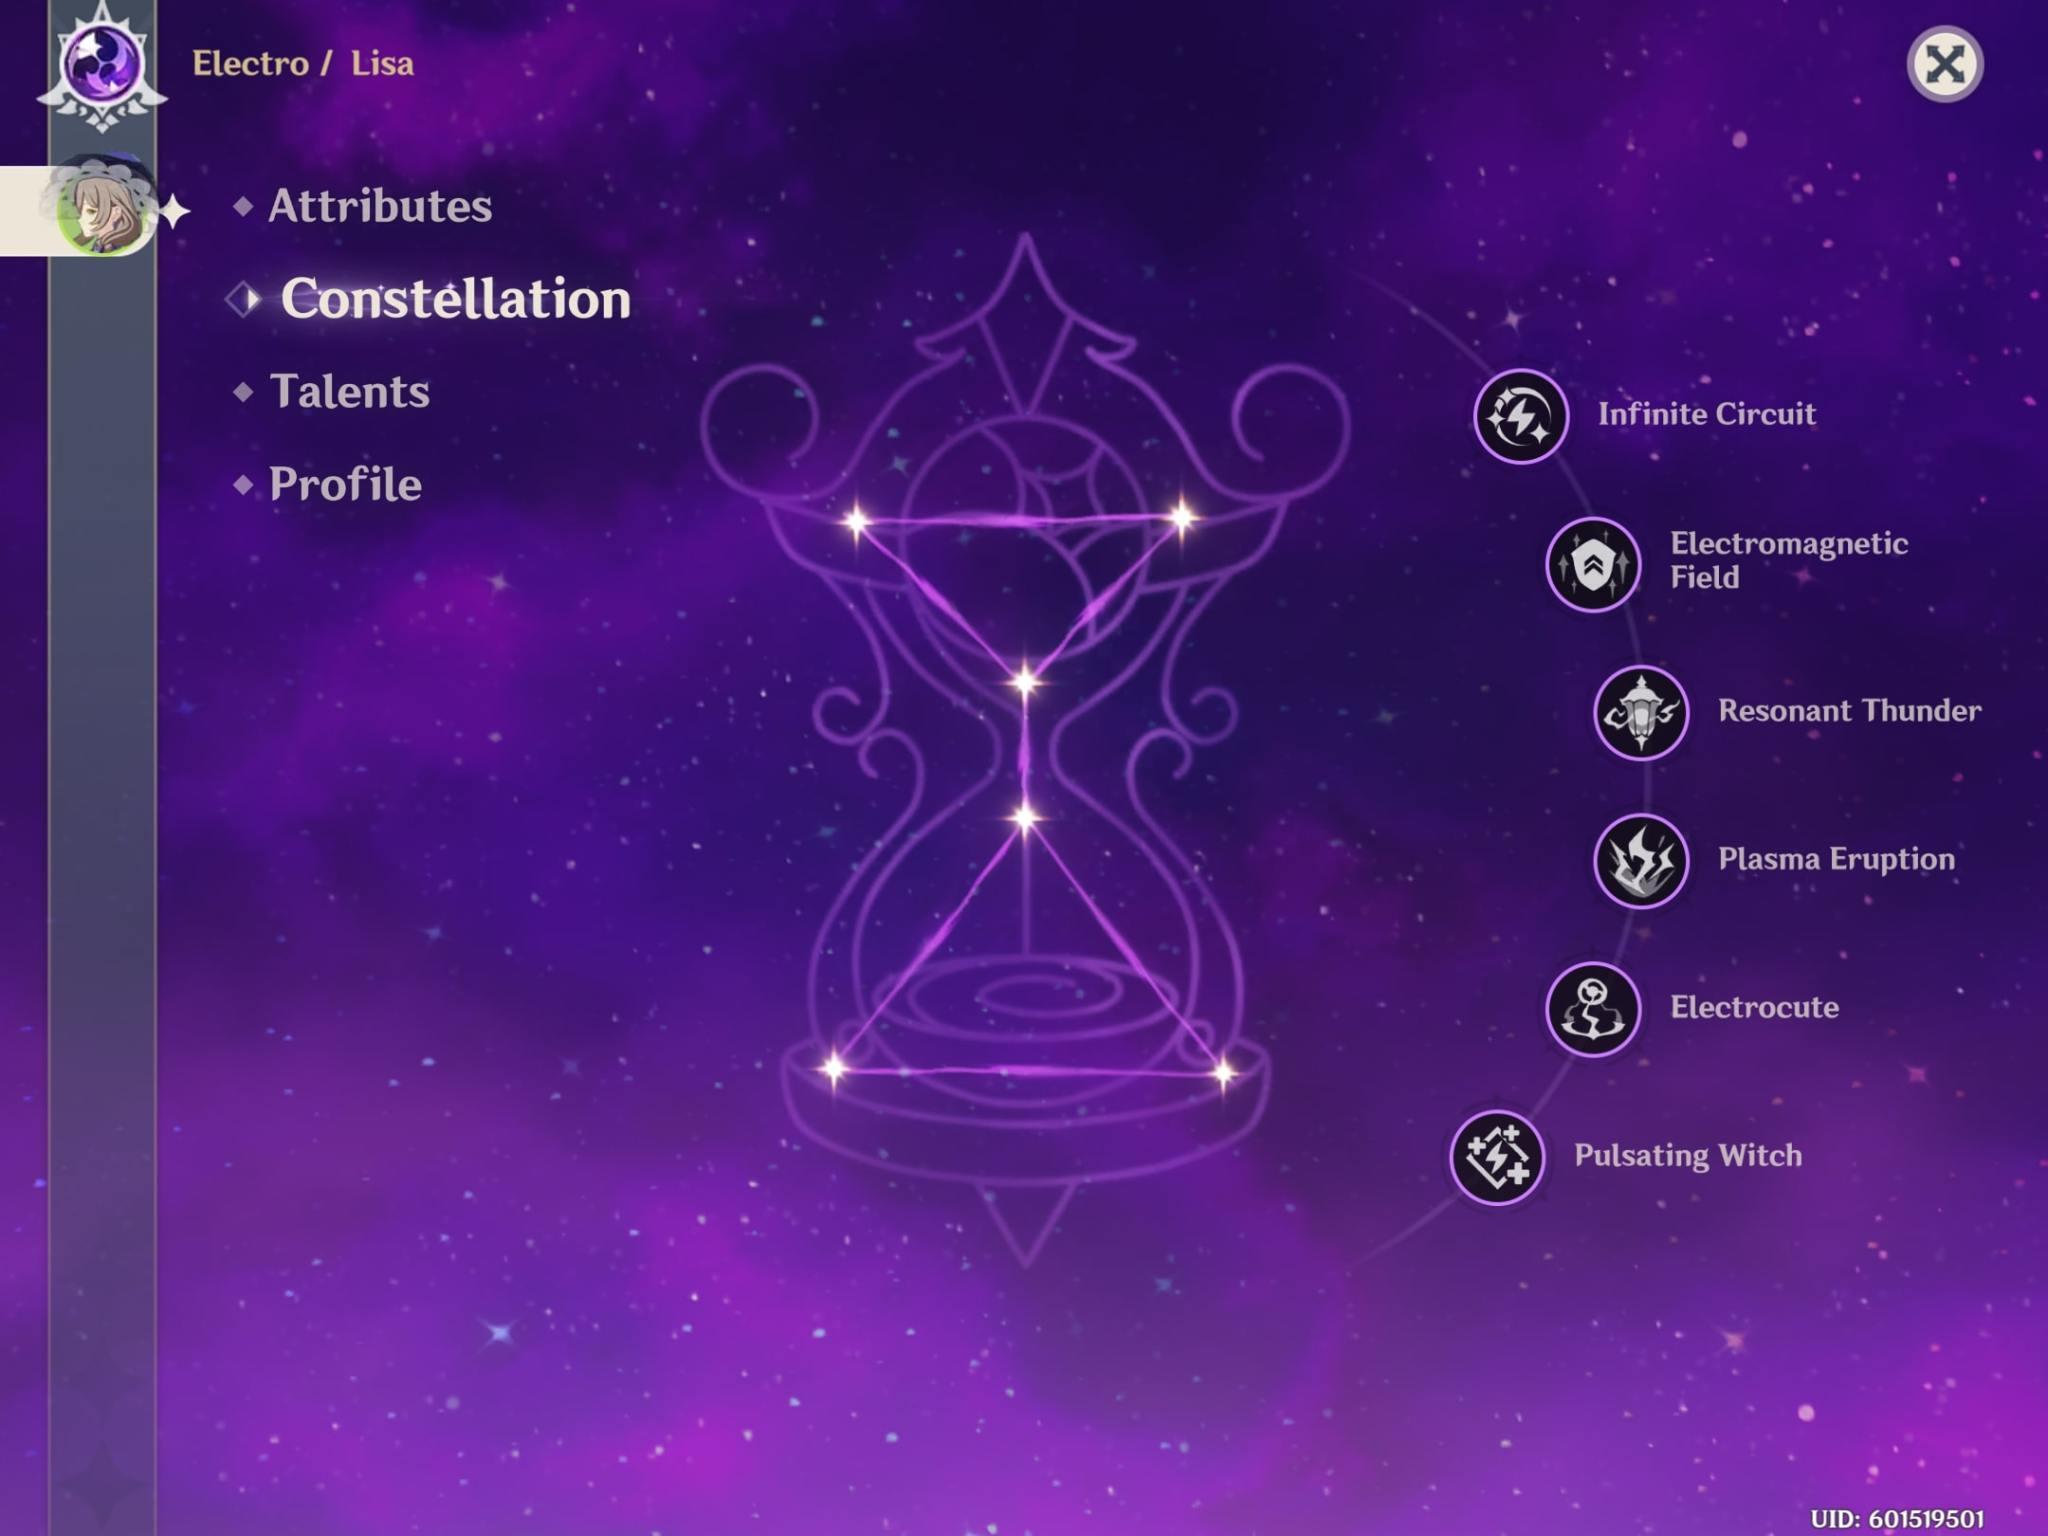 lisa constellation genshin impact